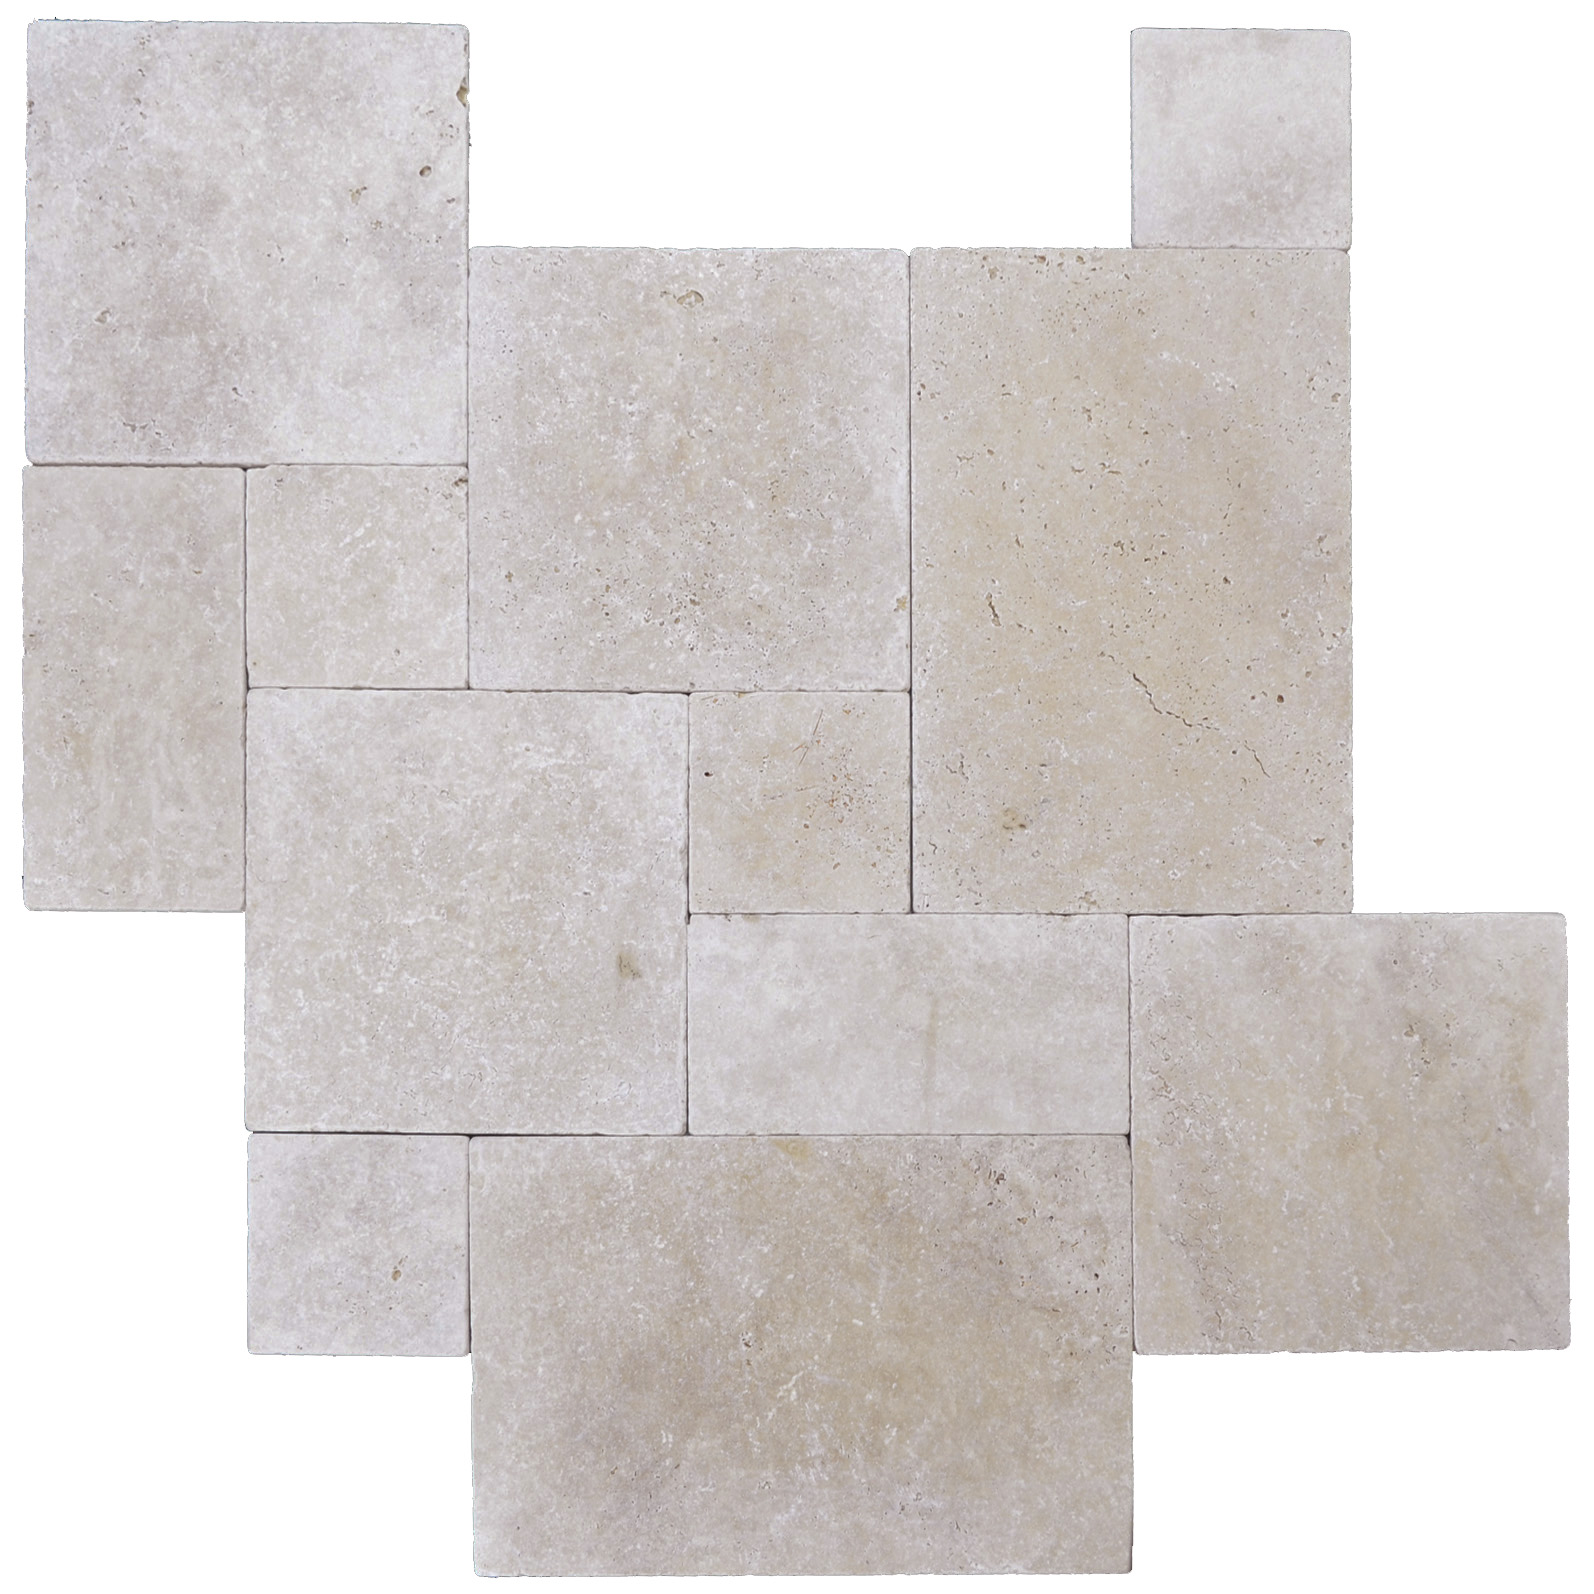 White Tumbled French Pattern Travertine Tiles-Travertine tiles sale-Atlantic Stone Source